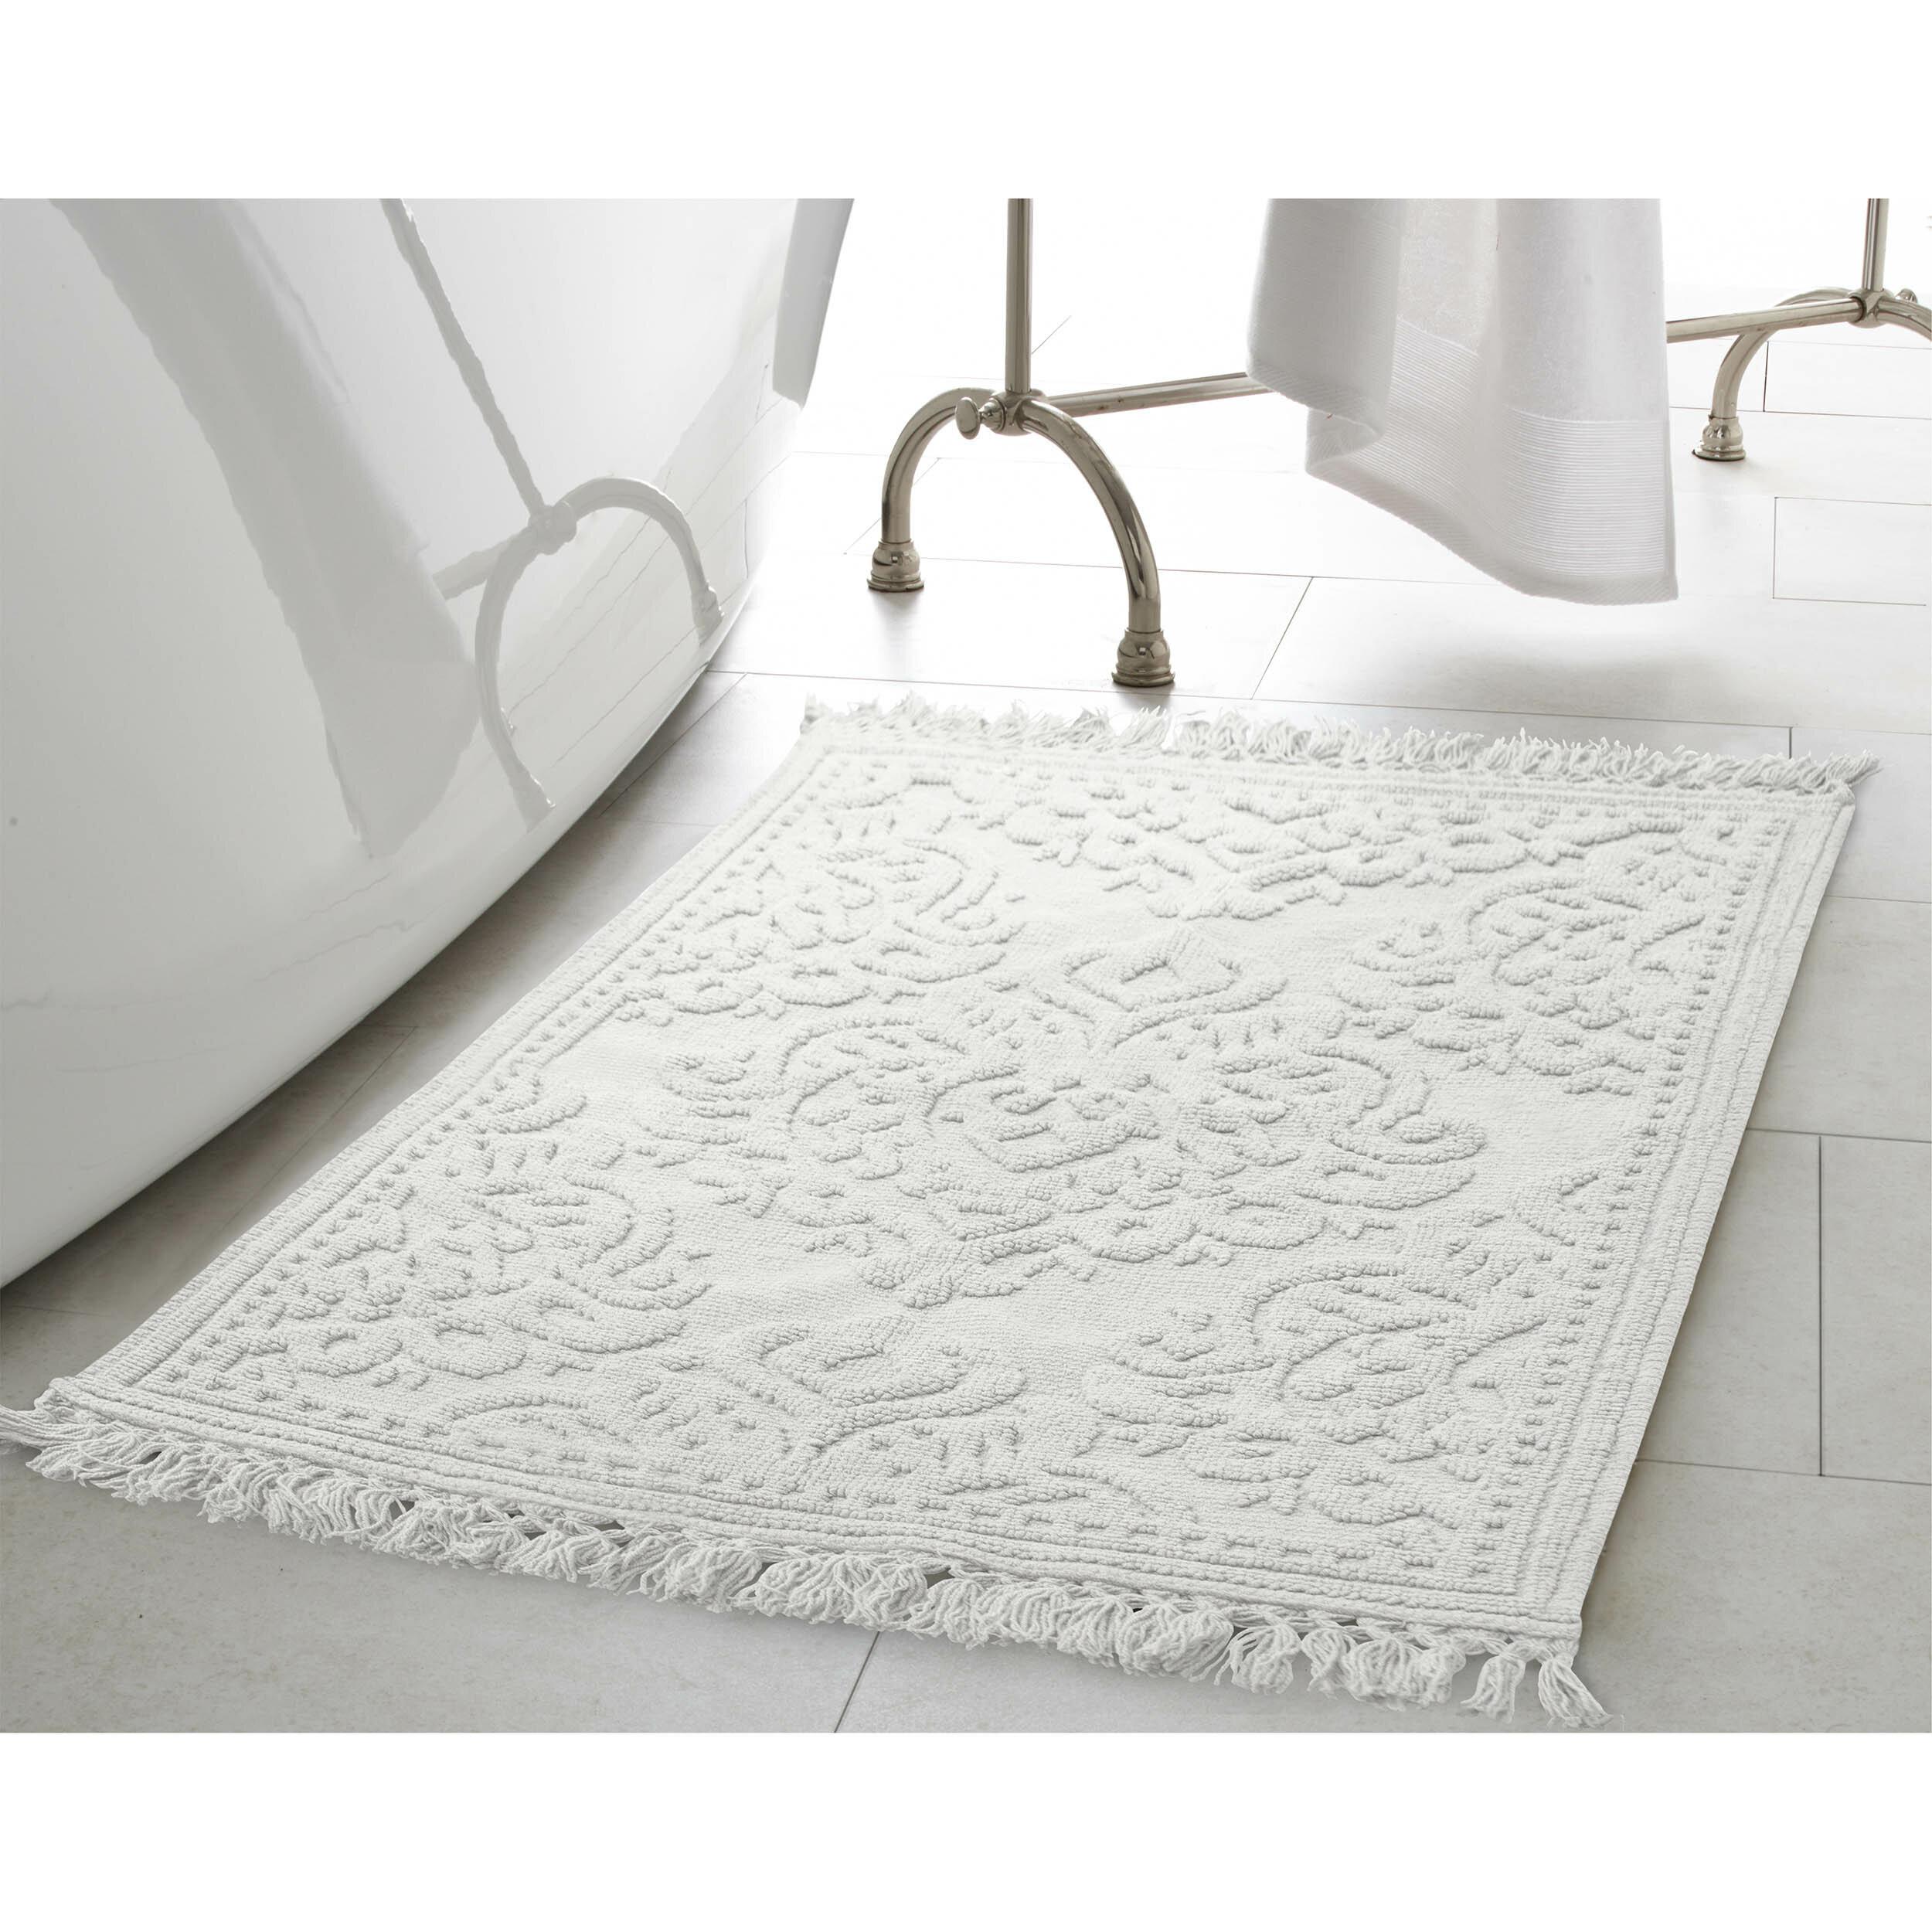 curtain carpet bathroom rug set best homesfeed piece for